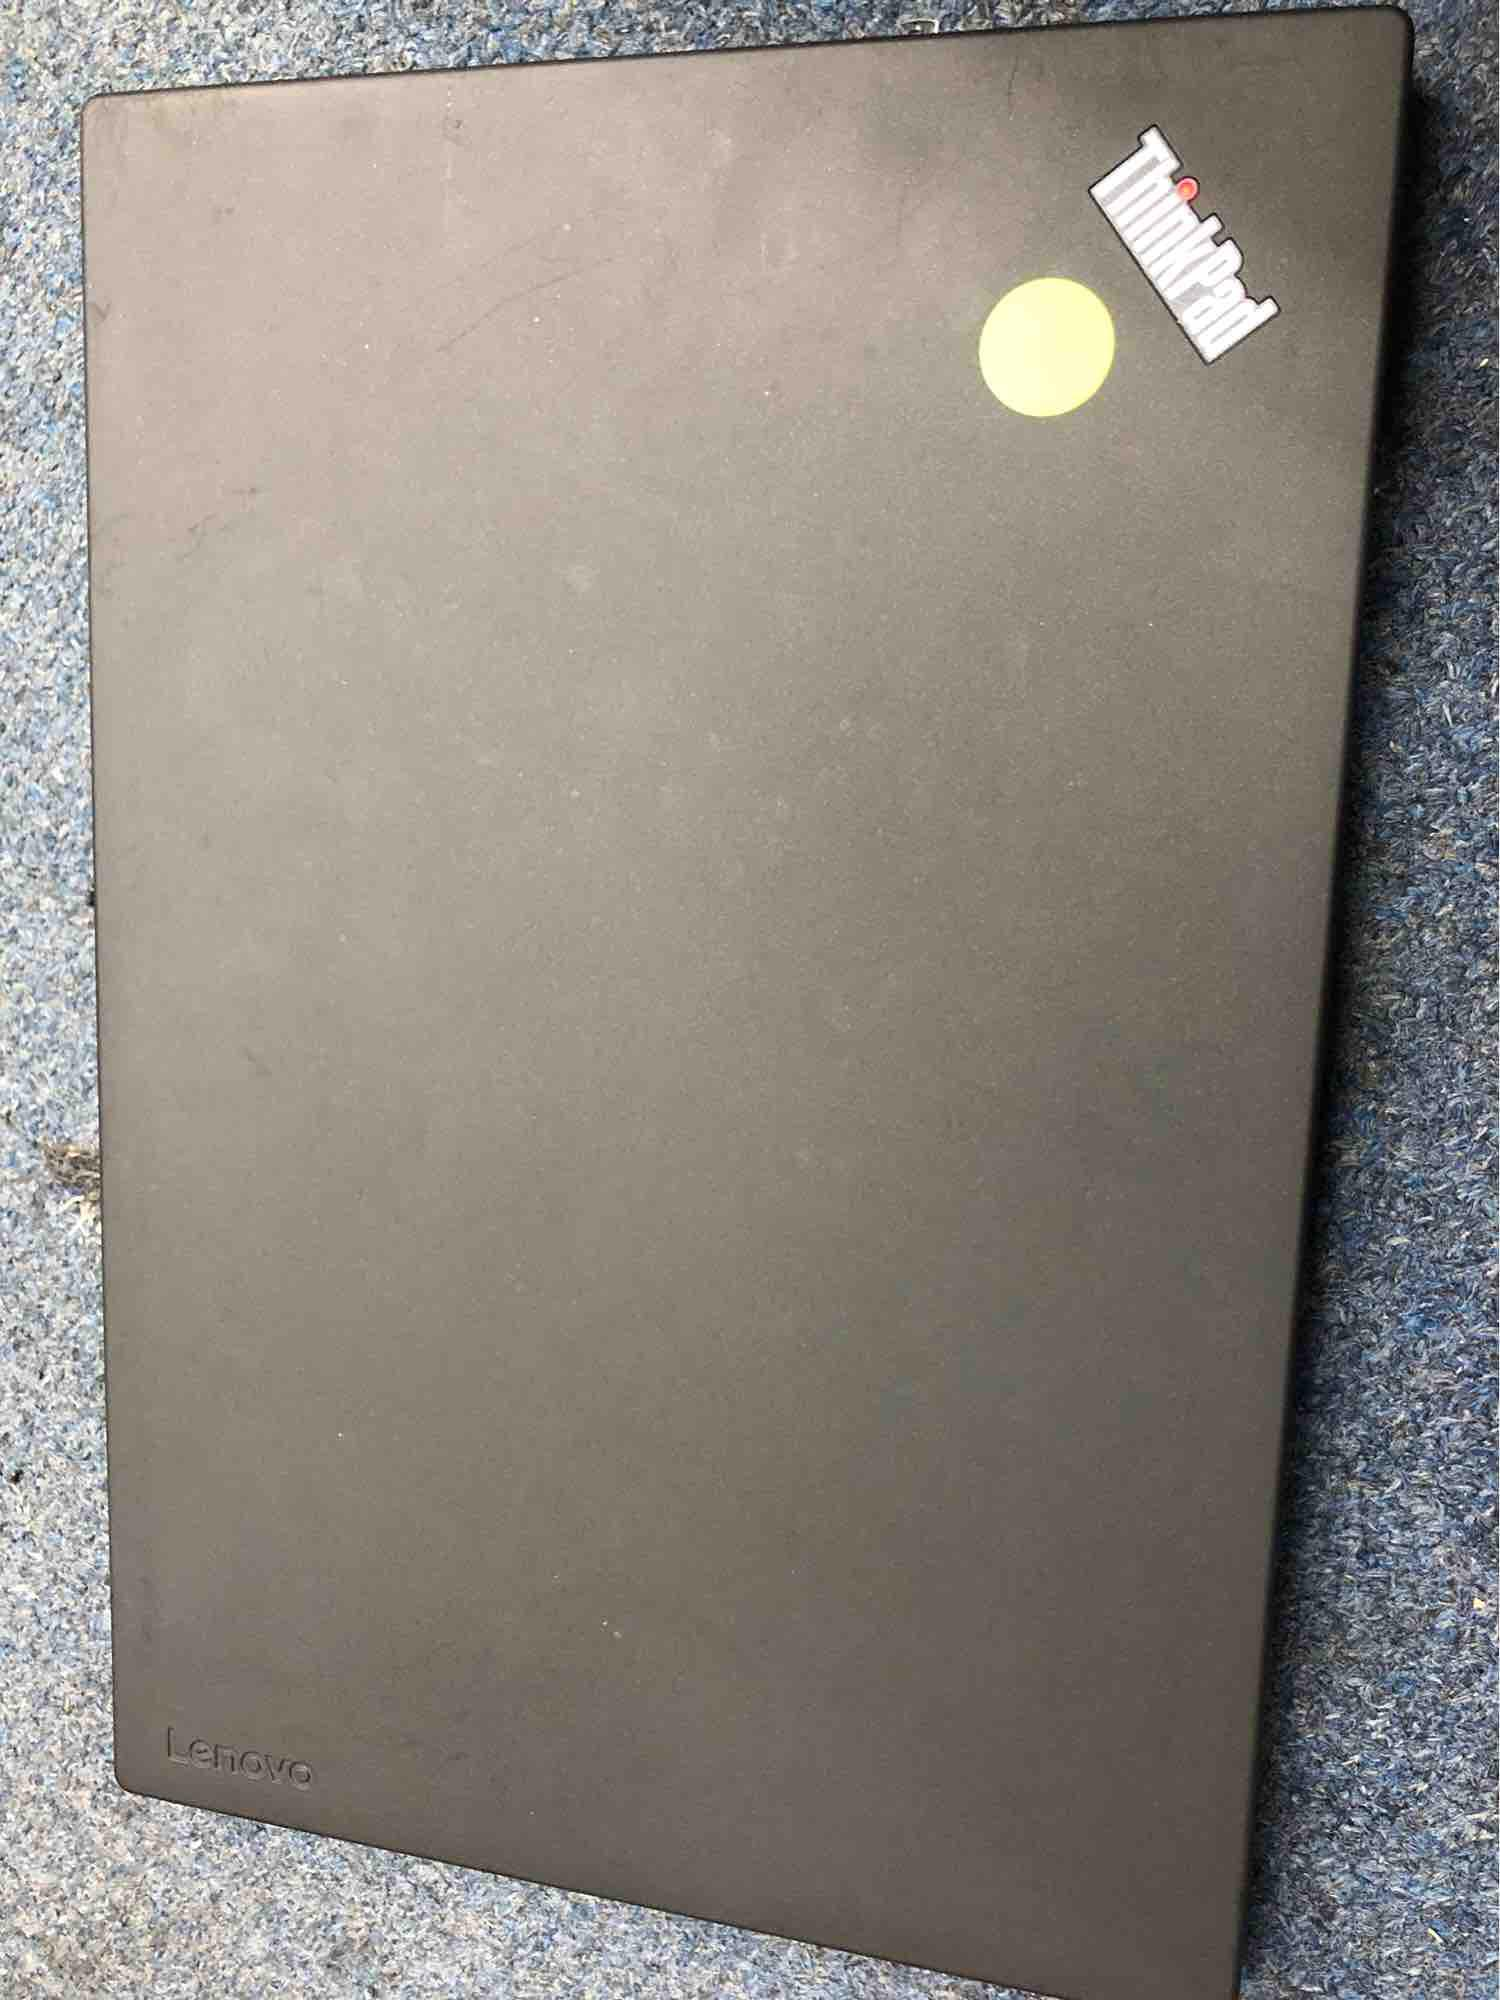 Lenovo X260 i5 6th gen 8gb 256gb Ssd  Refurbished Ultra book